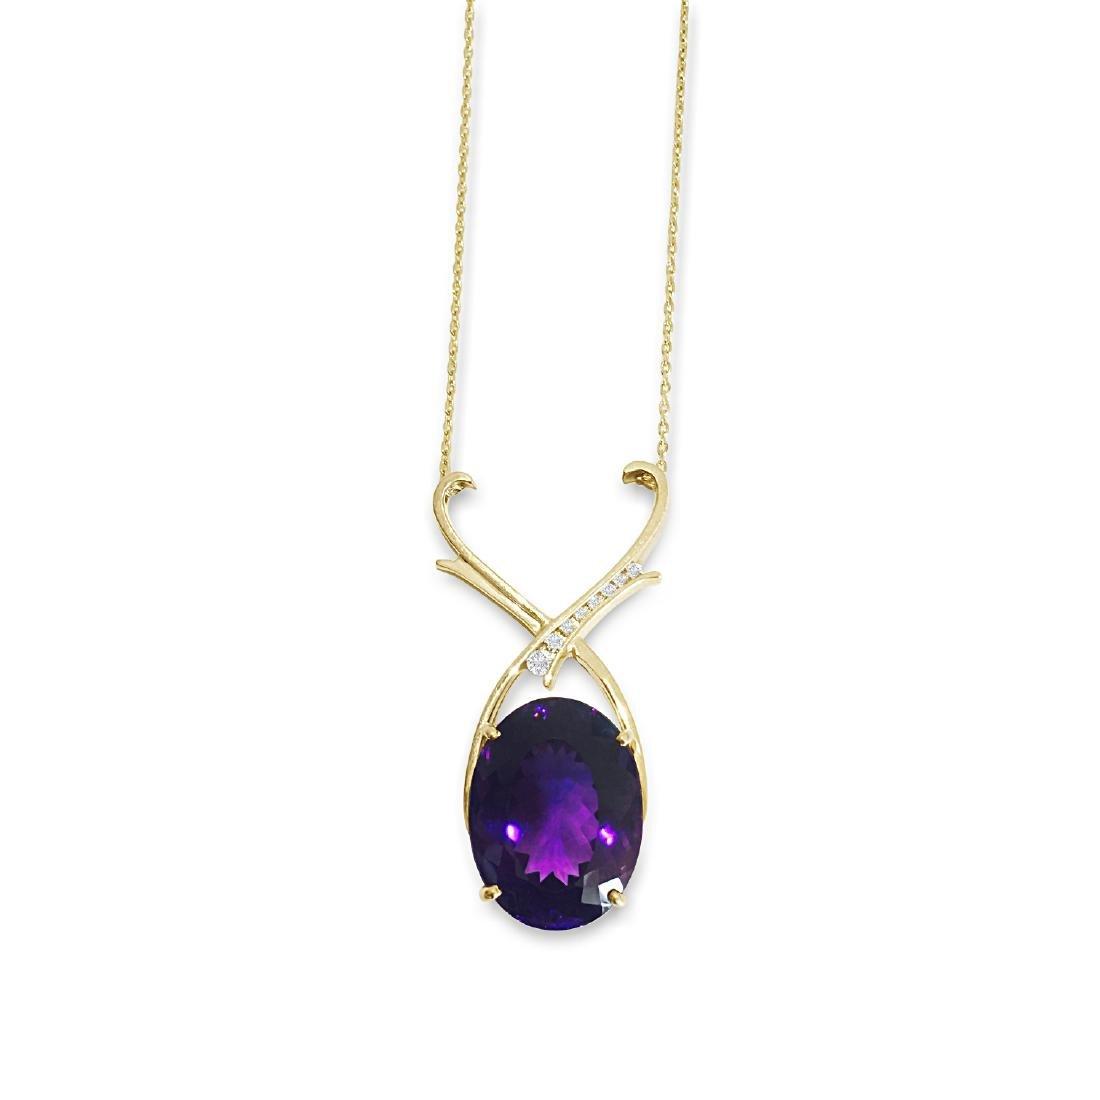 14K Gold 35 carat Amethyst & Diamond Pendant / NECKLACE - 2